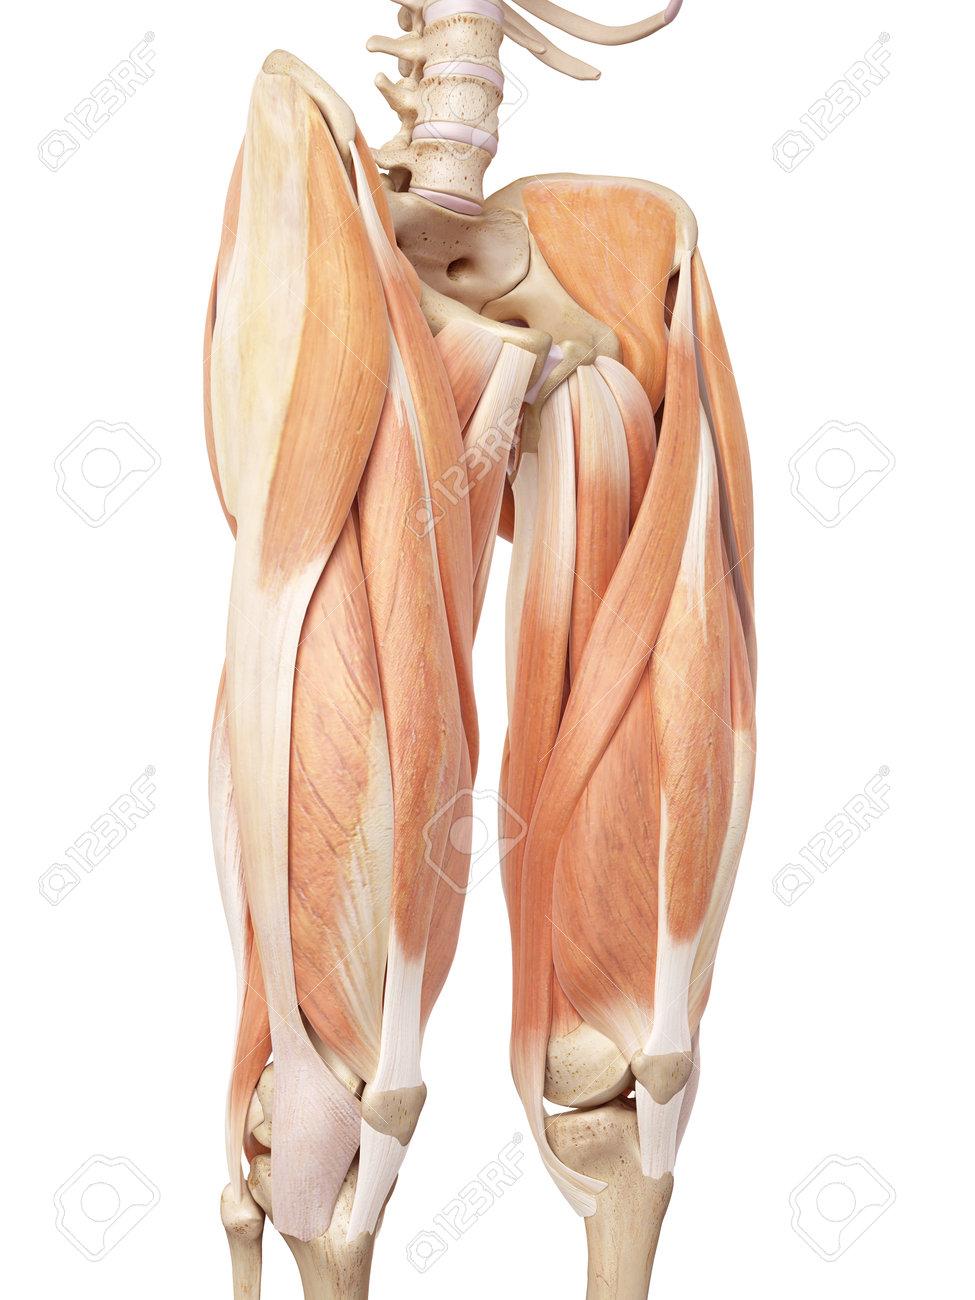 Thigh Bone Stock Photos. Royalty Free Thigh Bone Images